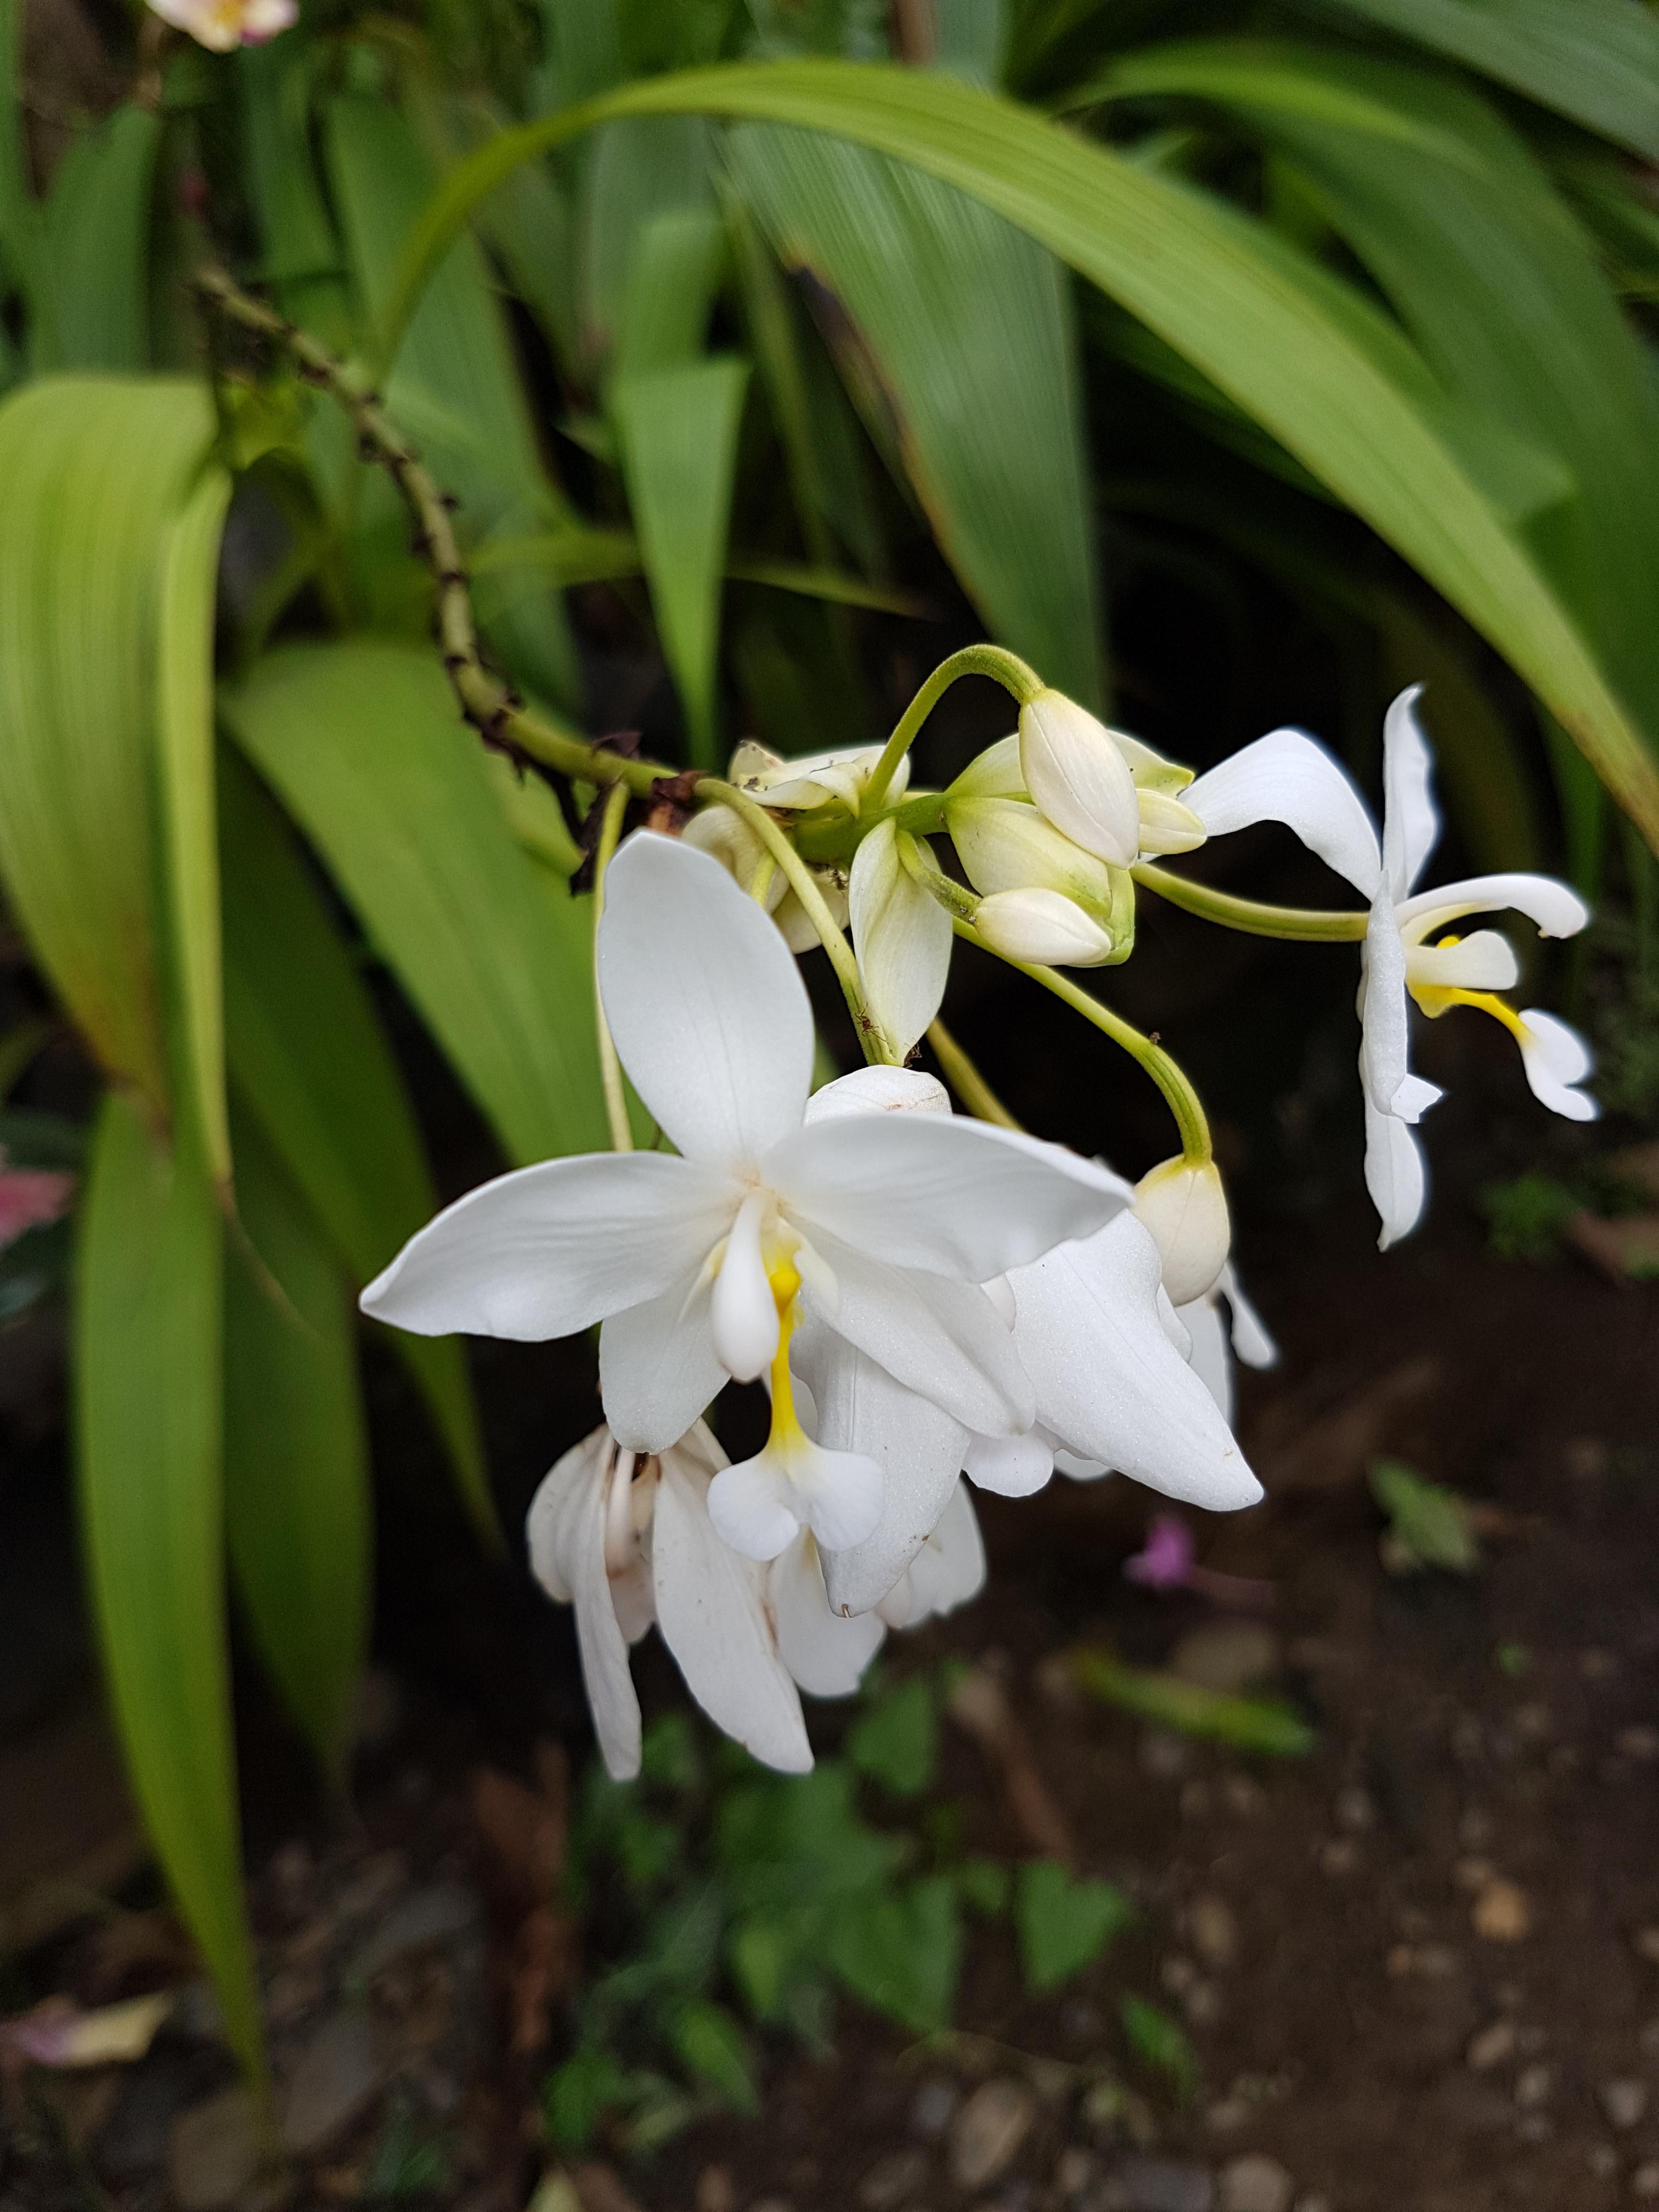 Spathoglottis plicata wikipedia spathoglottis plicata philippine ground orchid white cultivarg mightylinksfo